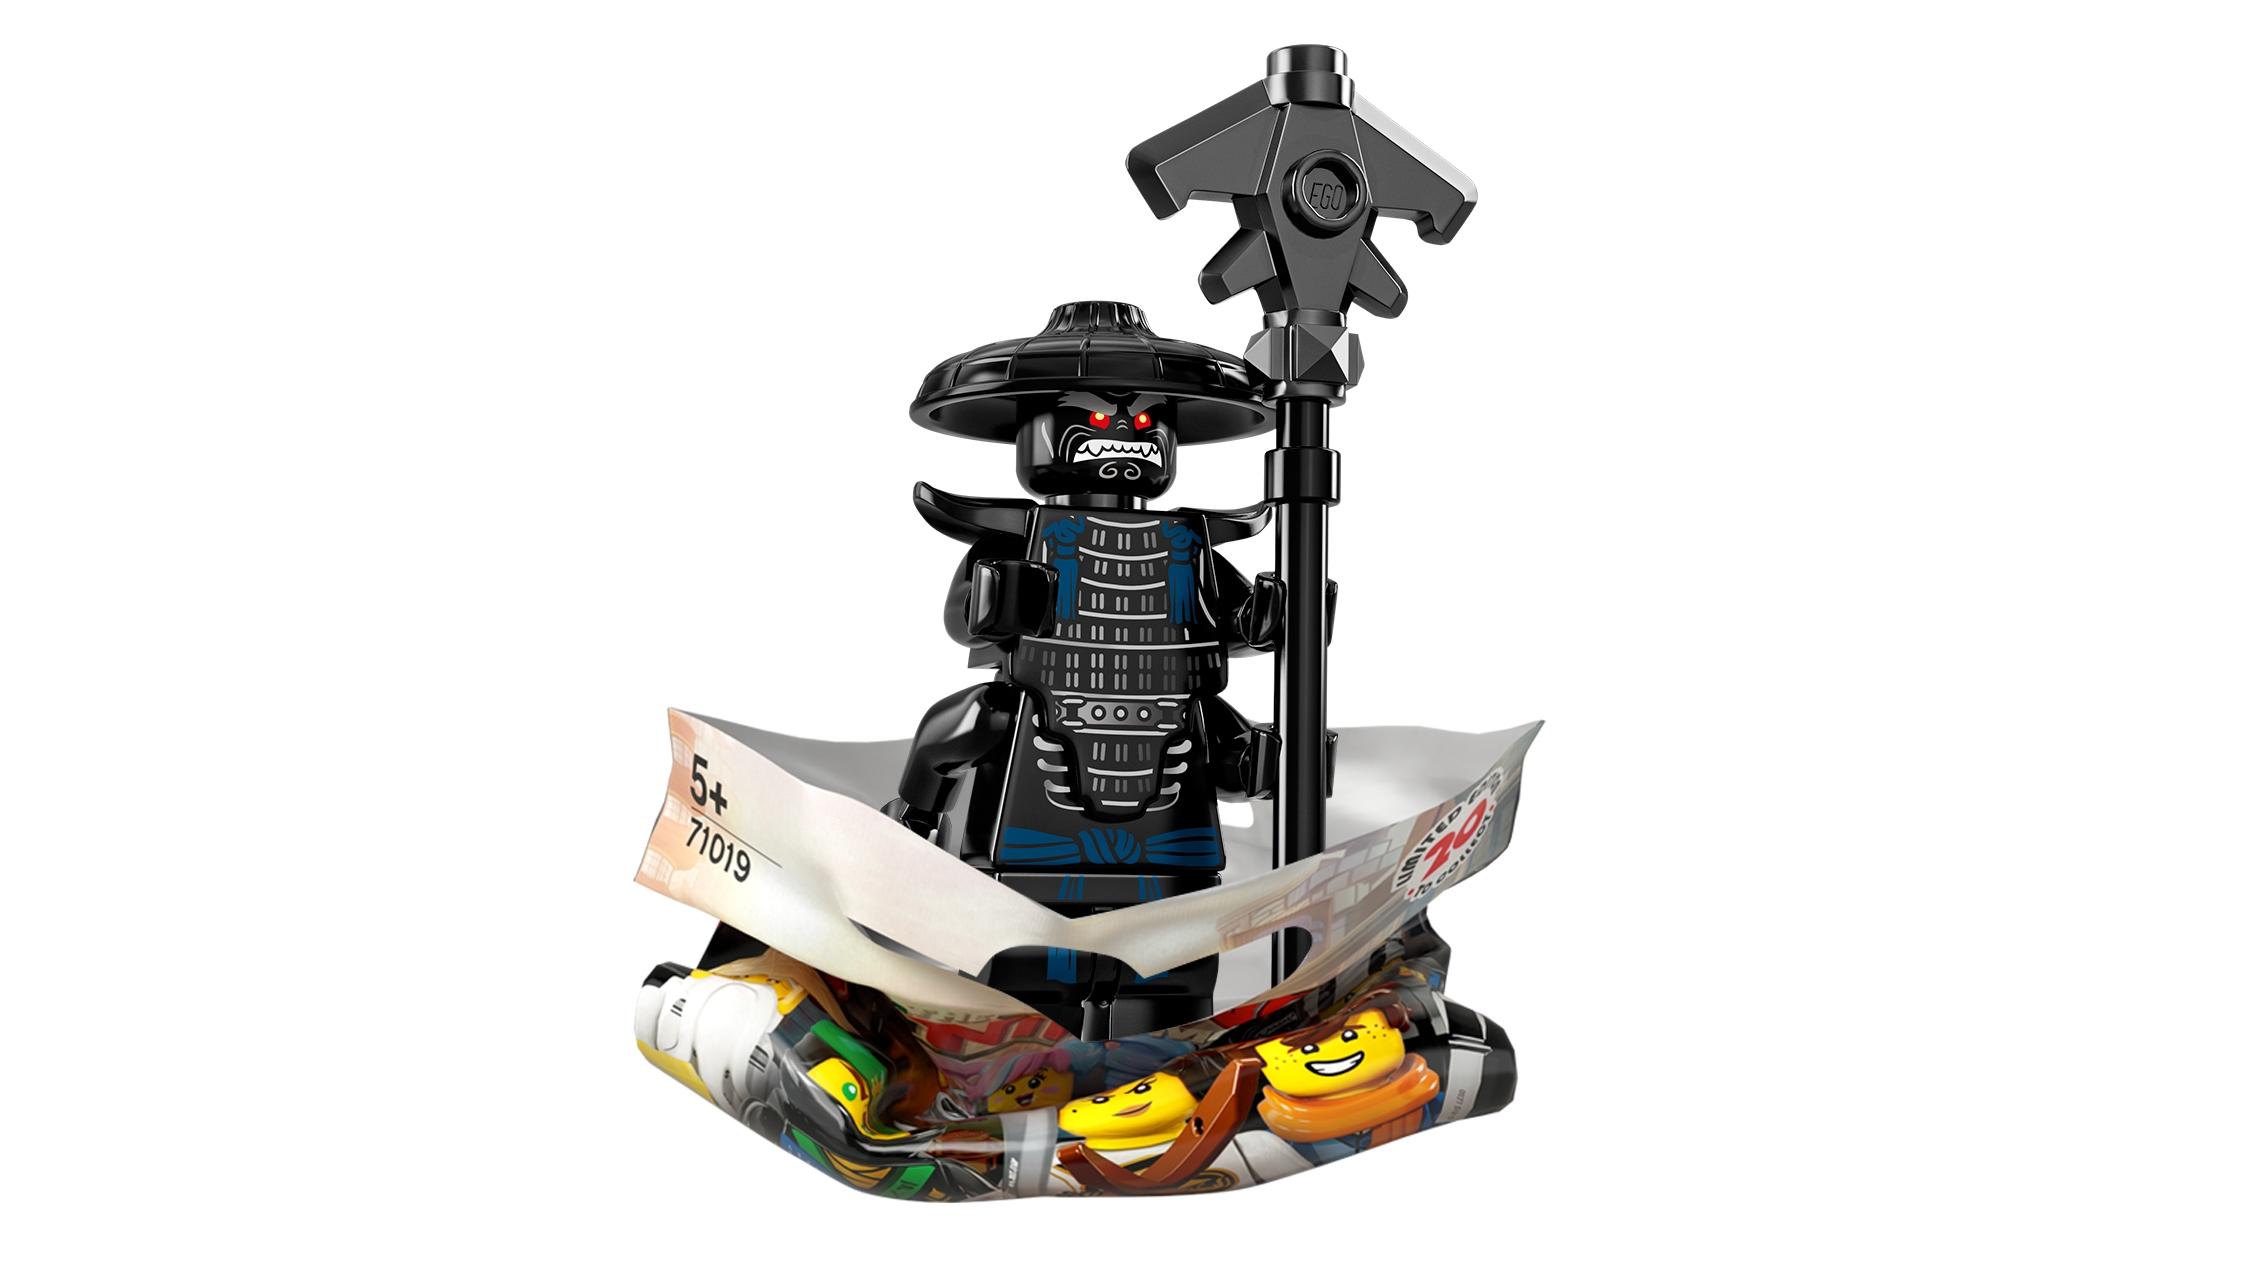 Møt Badebukse Batman LEGO Minifigures Artikler LEGO.no